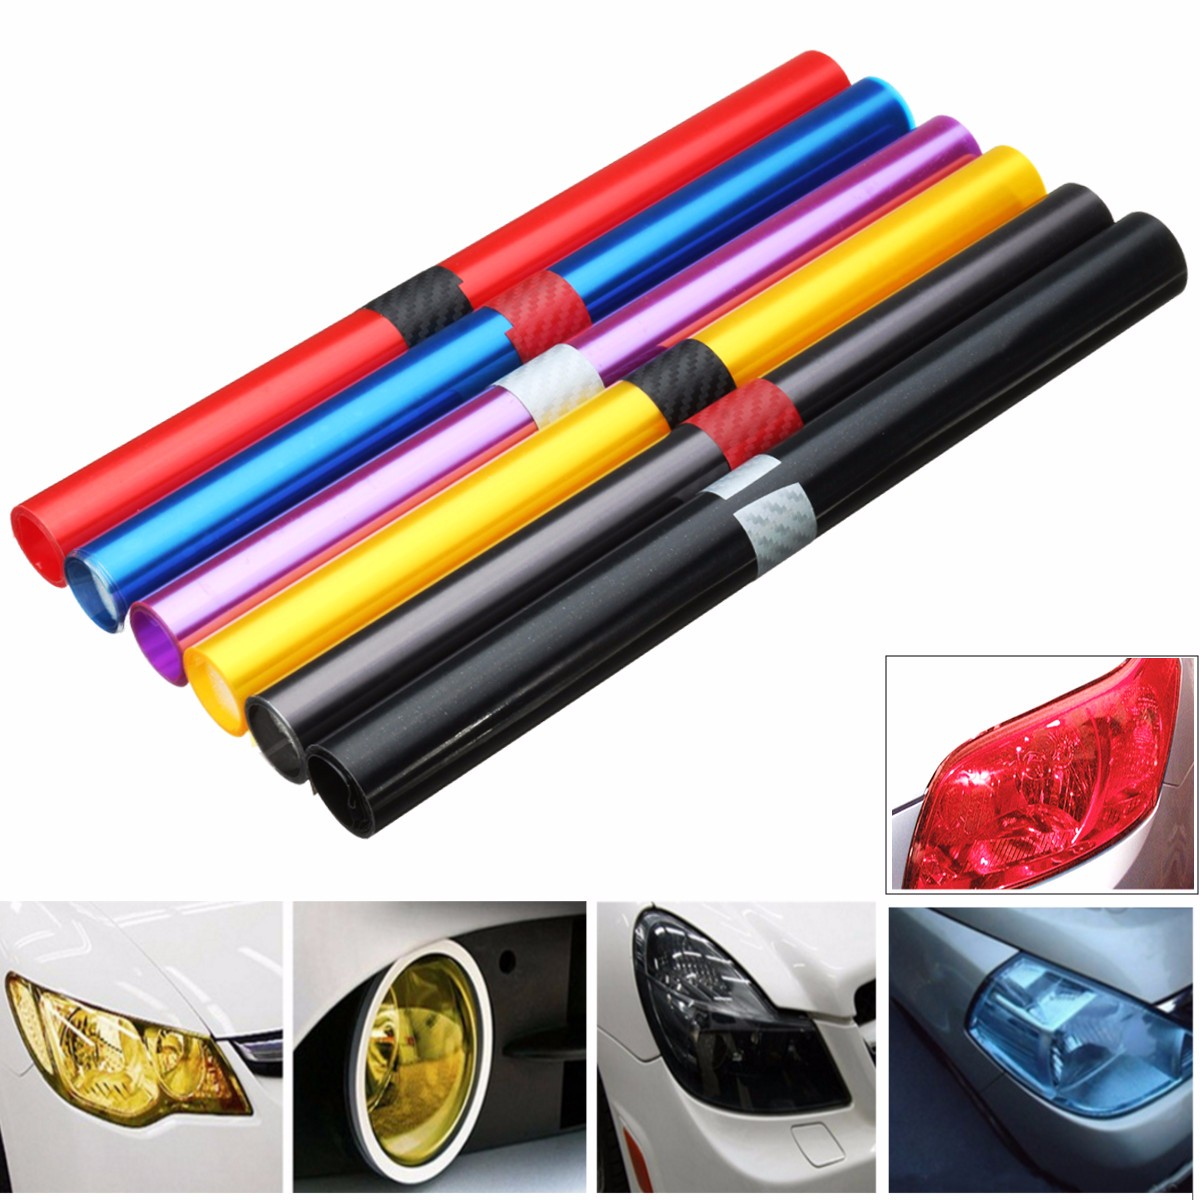 30 X 100cm PVC Car Foil Film Auto Vehicle Tail Light Headlight Wrap Sticker Decal Purple Blue Red Yellow Black Brown